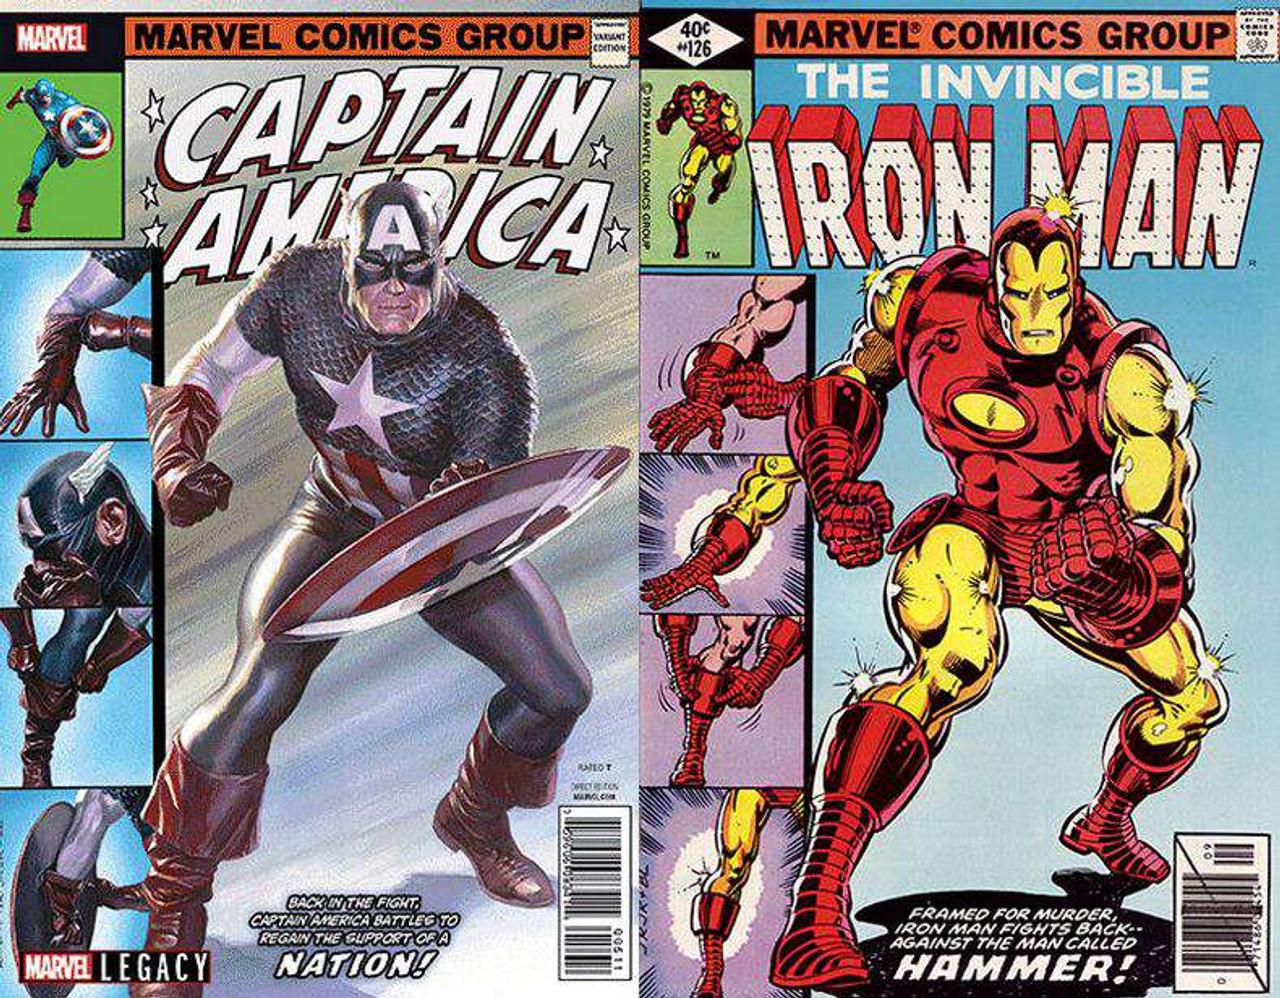 Your Avengers captain america comic book covers authoritative